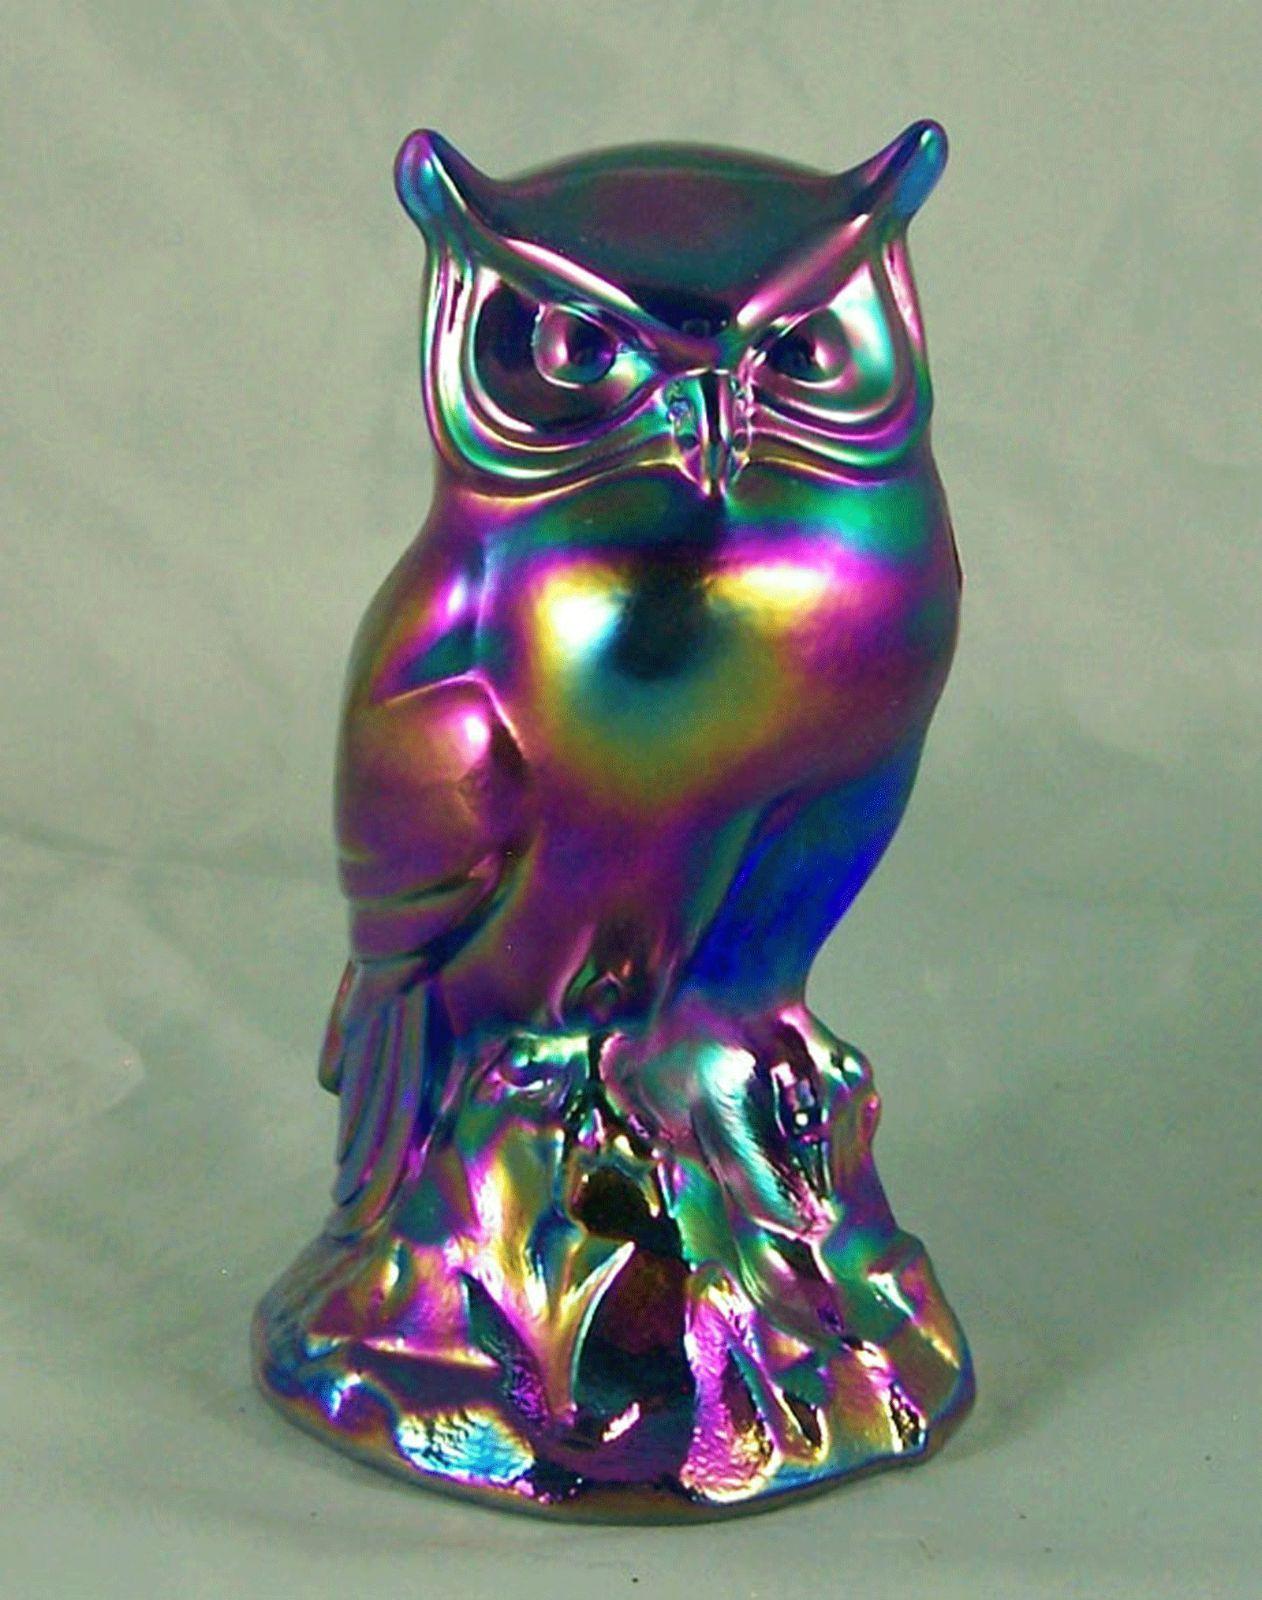 MIB Fenton Cobalt Blue Favrene Carnival Perched Owl Art Glass Paperweight Figure